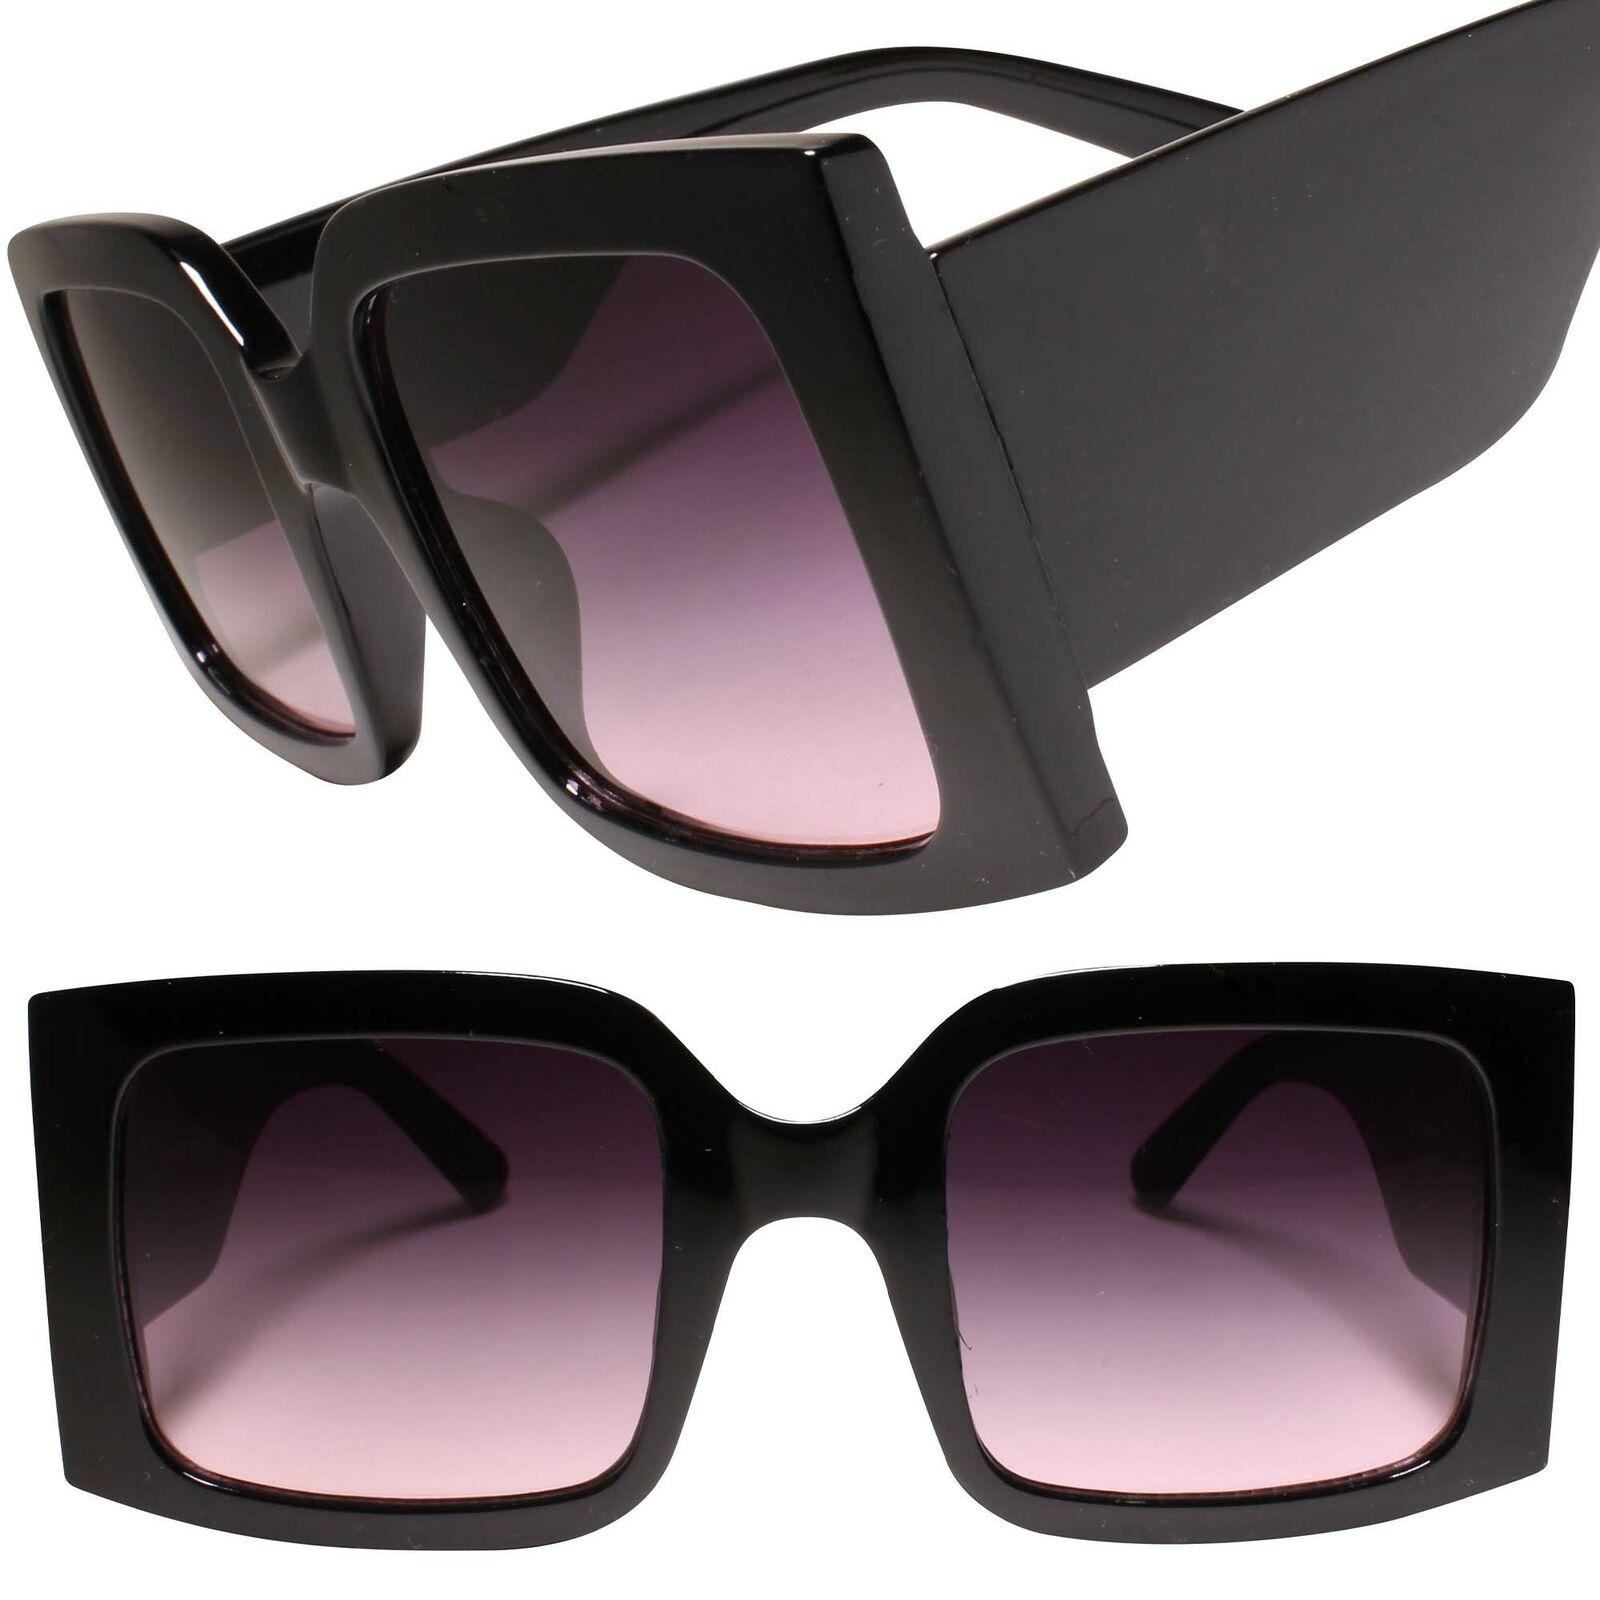 Classy Retro Oversized Exaggerated Womens Thick Frame Black Square Sunglasses